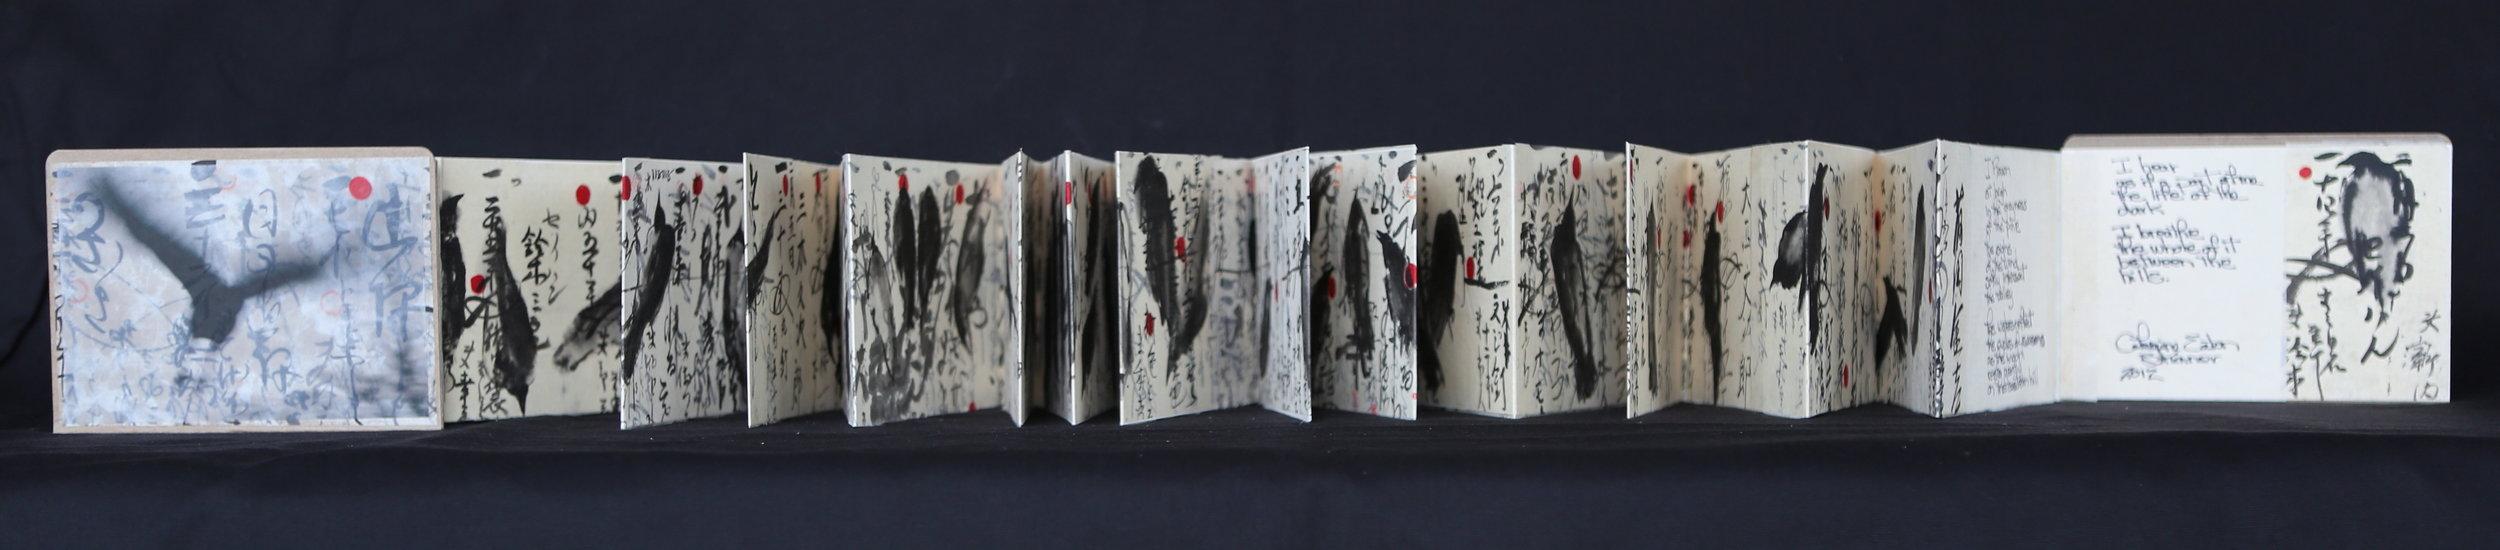 108 Raven Chronicles Book